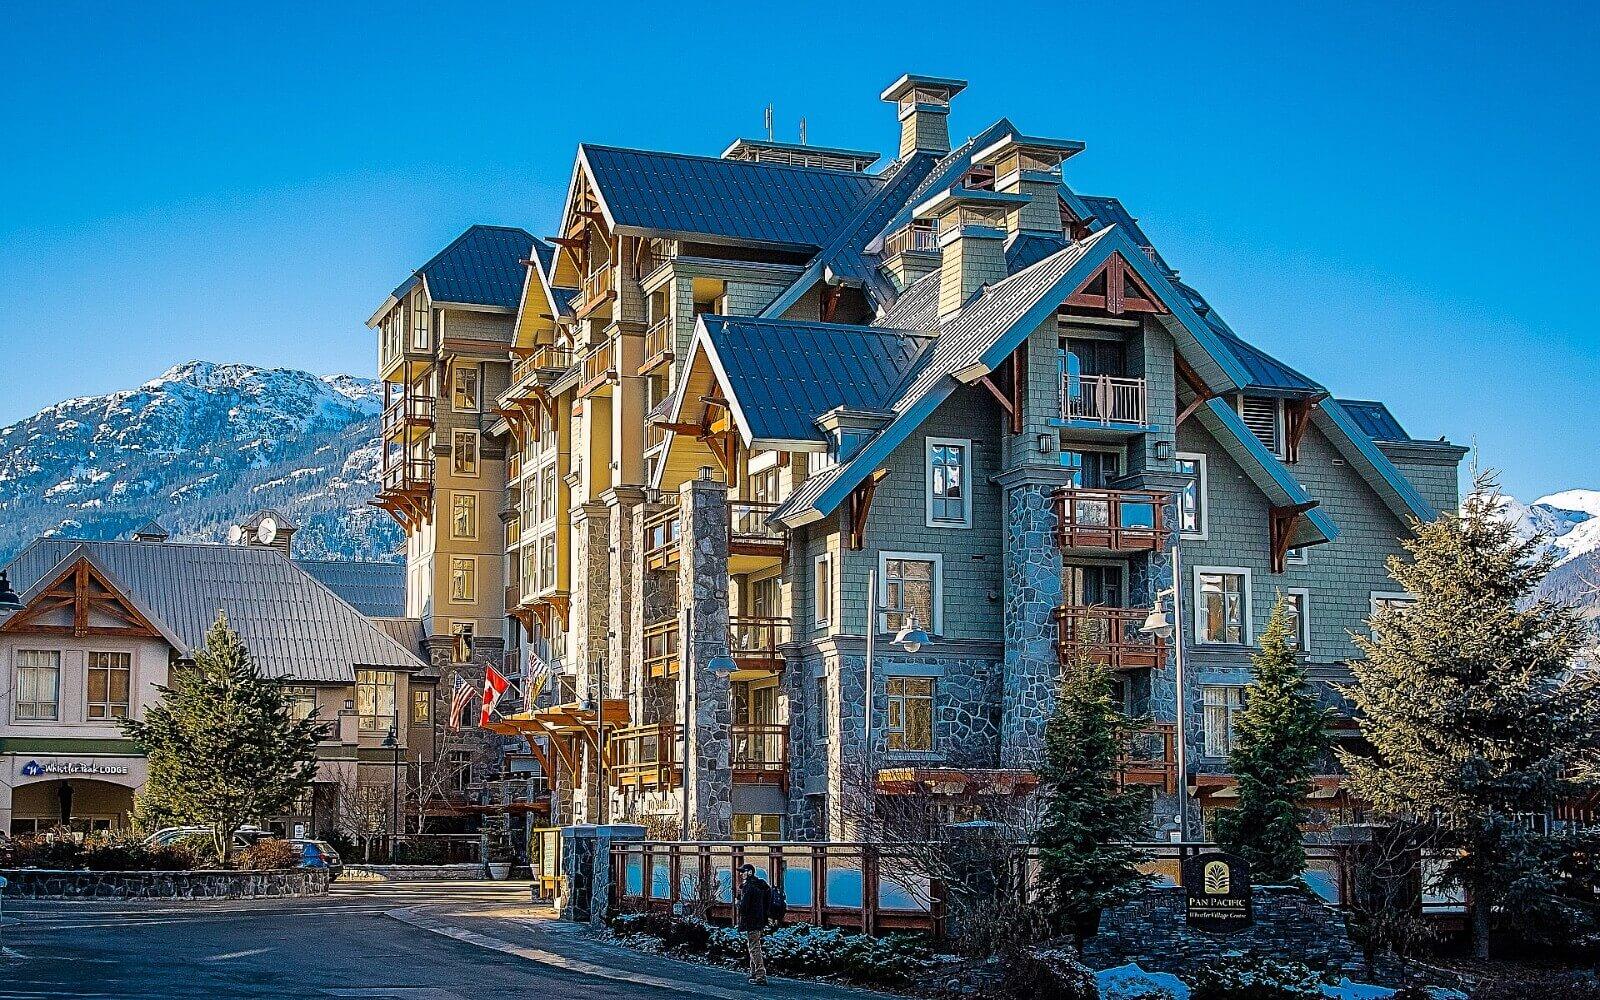 A ski lodge in Whistler Village